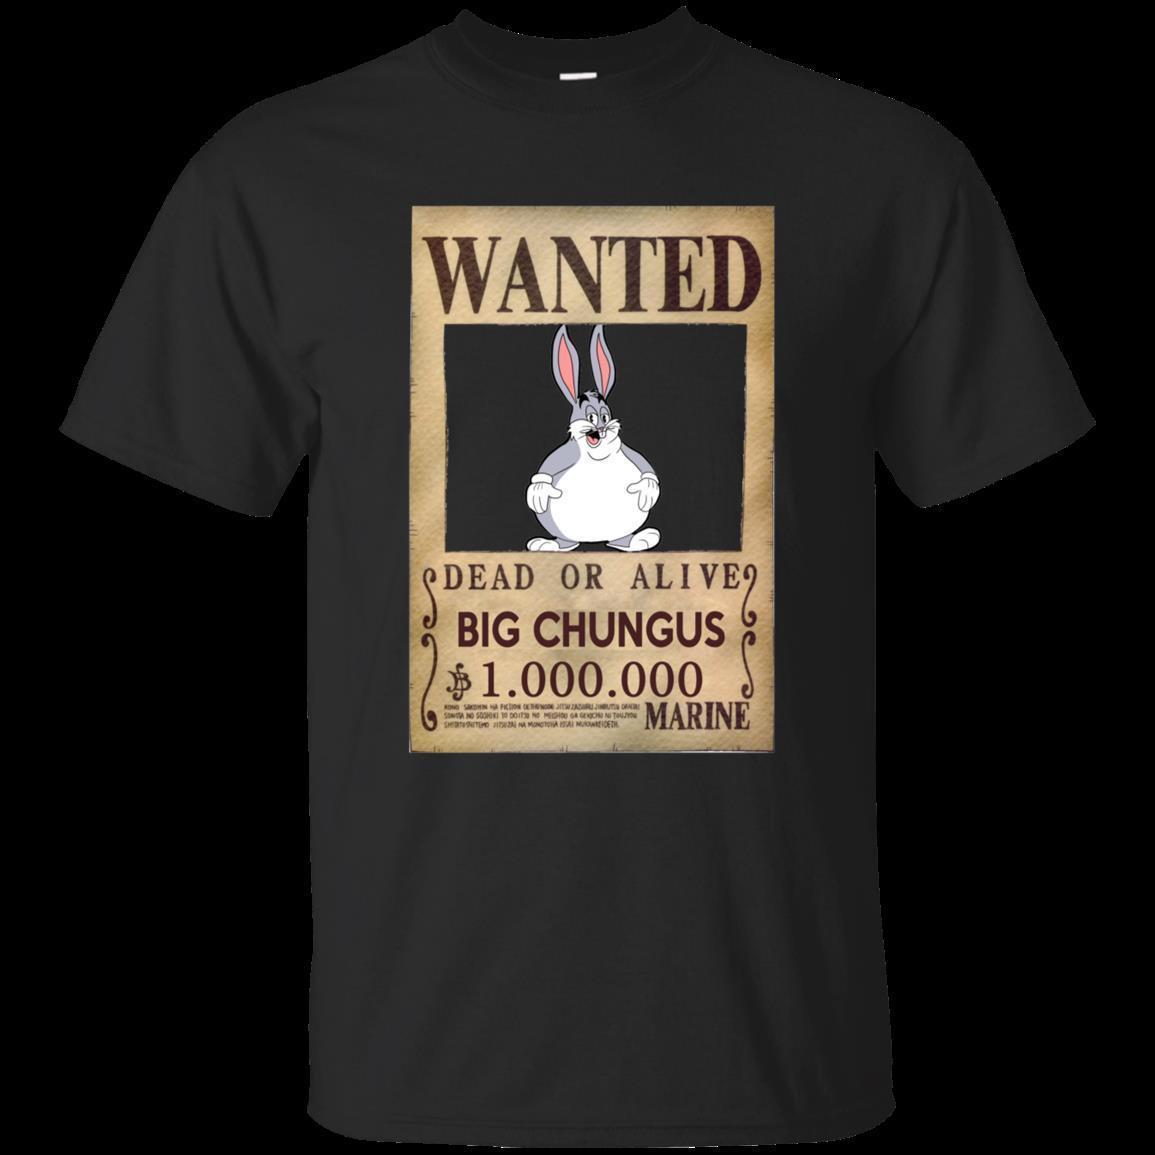 Black T Shirt Big Chungus Meme For Men Women Youth Size S 5xl Men